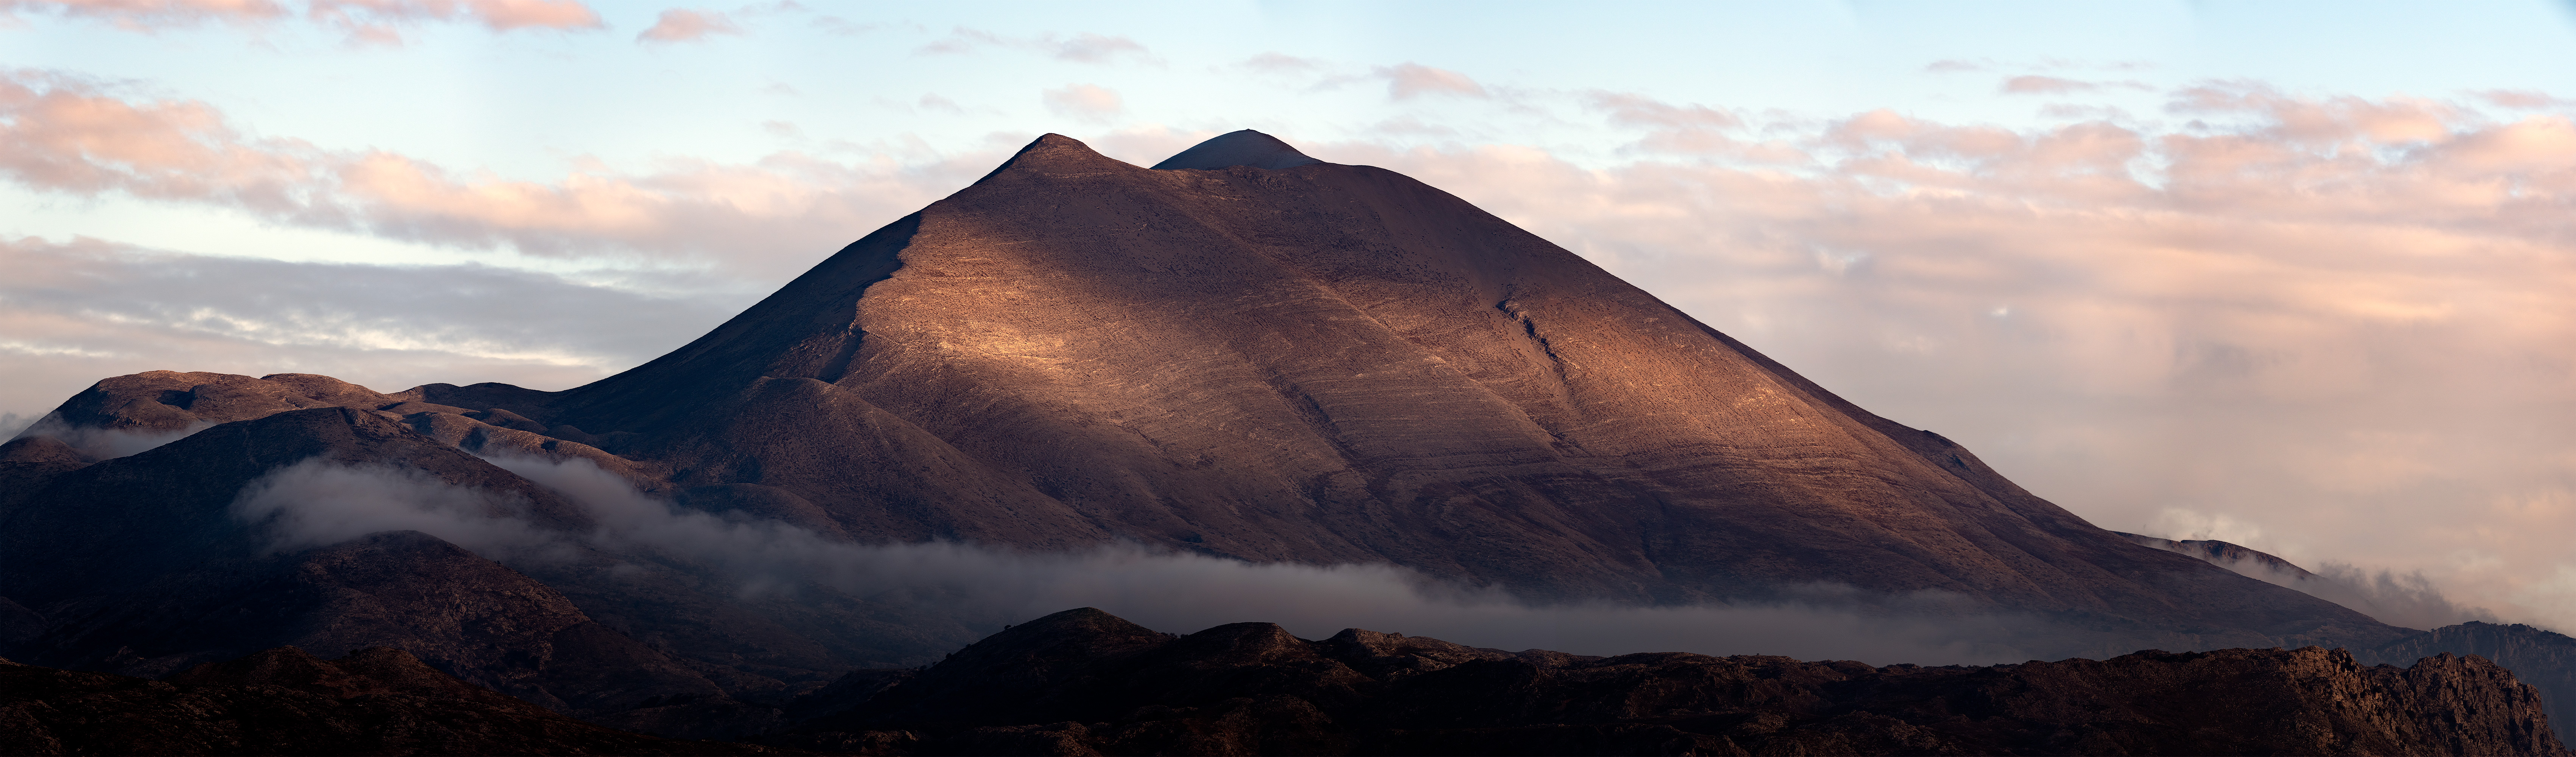 Mount Ida, Crete